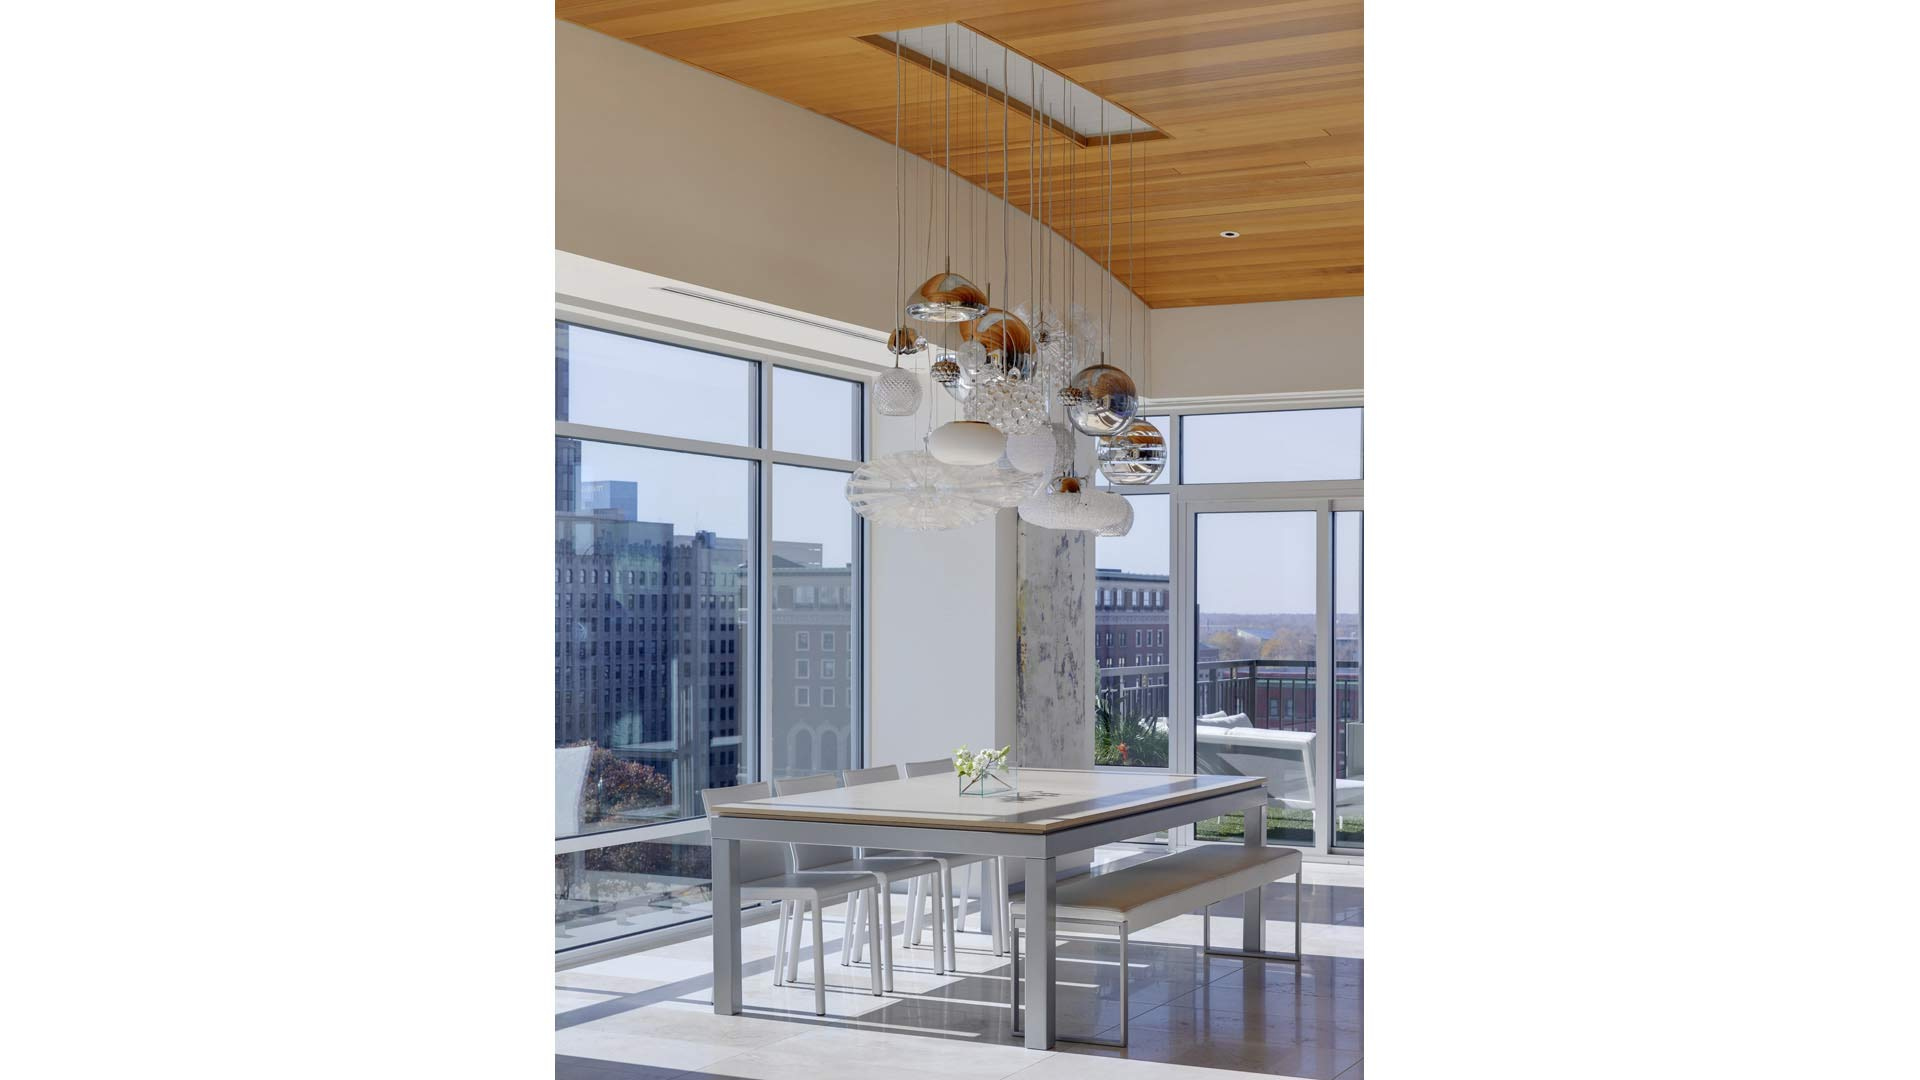 Adagio Penthouse Interior - Dining Room Pendant Light Constellation - HAUS Architecture, Christopher Short, Indianapolis Architect